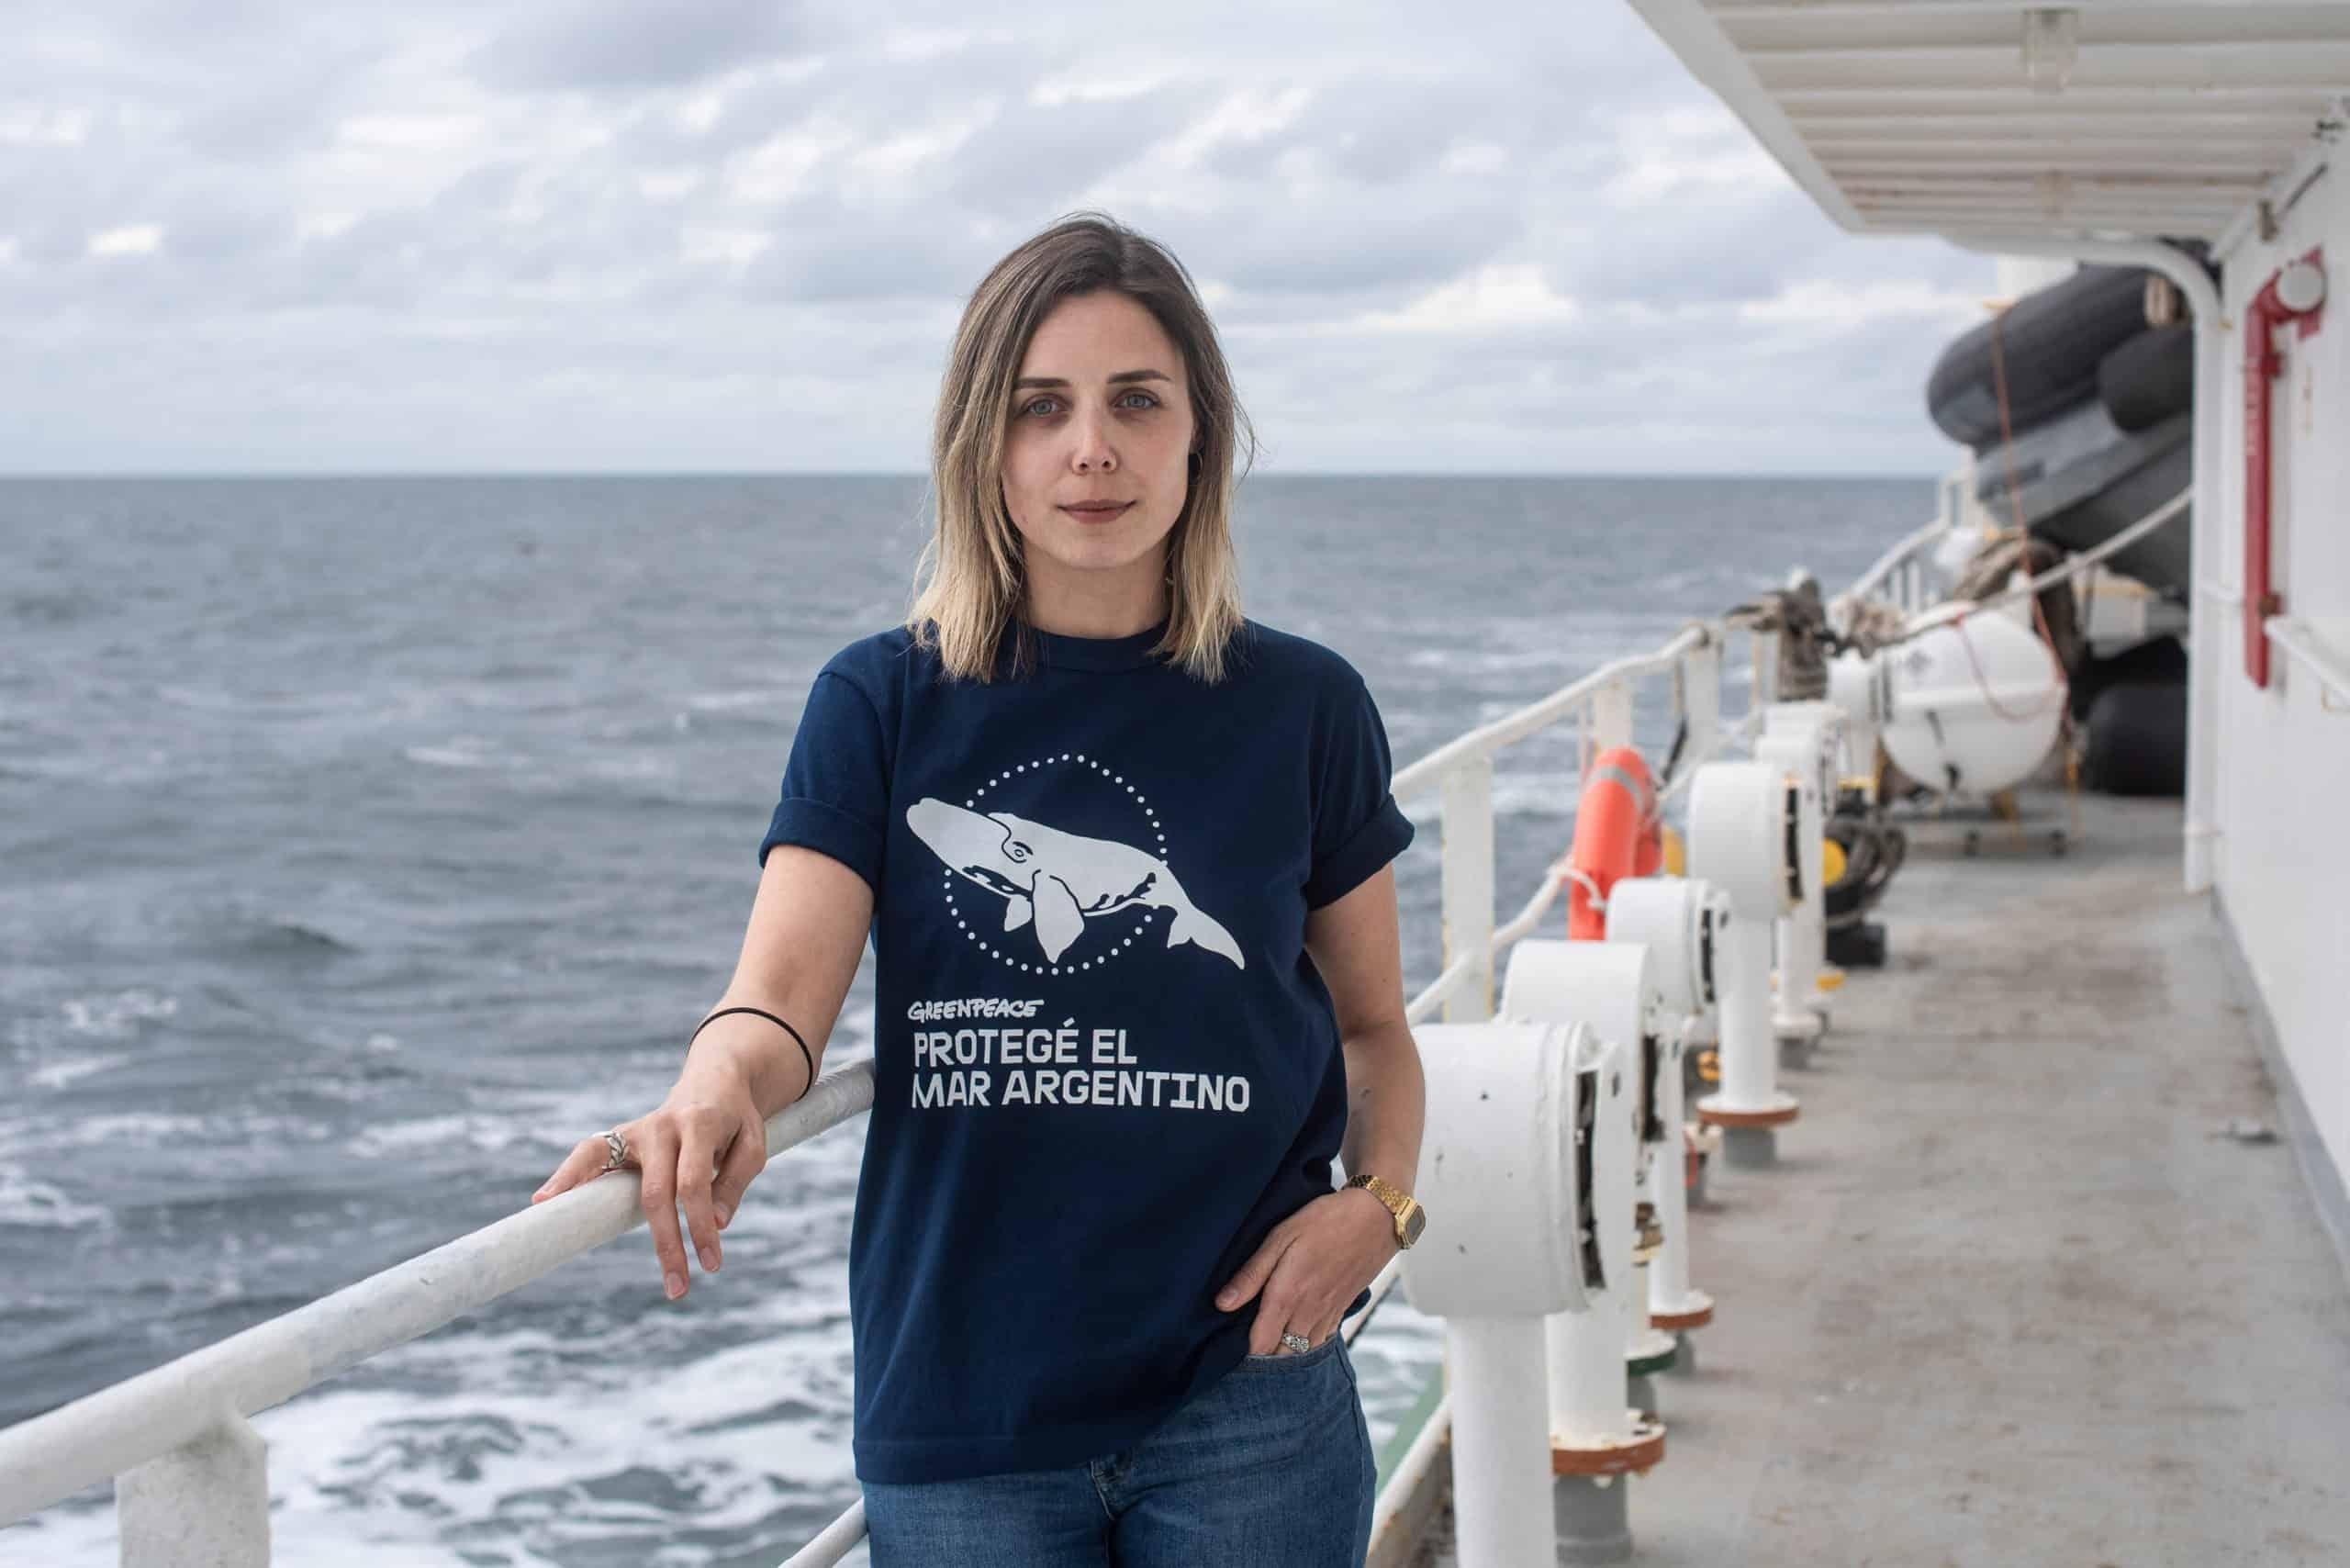 Luisina Vueso, Greenpeace Campaigner stands for a portrait on board of the Esperanza ship on November 10th, 2019. Atlantic Ocean, Argentina.